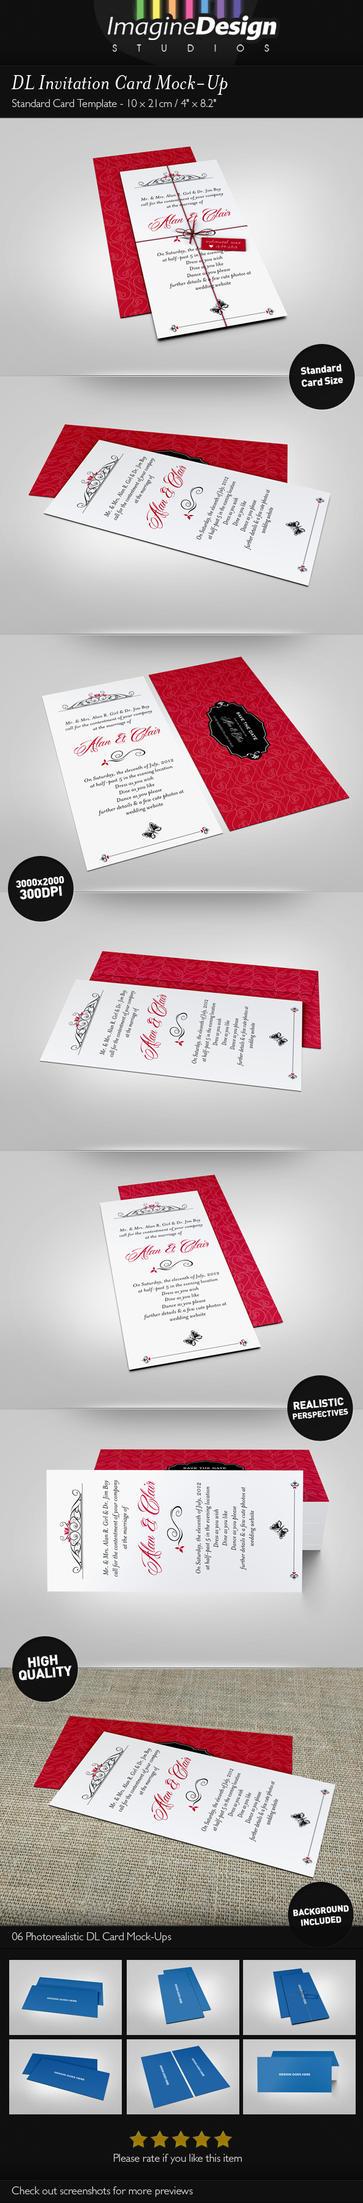 DL Invitation Card Mock-Up by idesignstudio